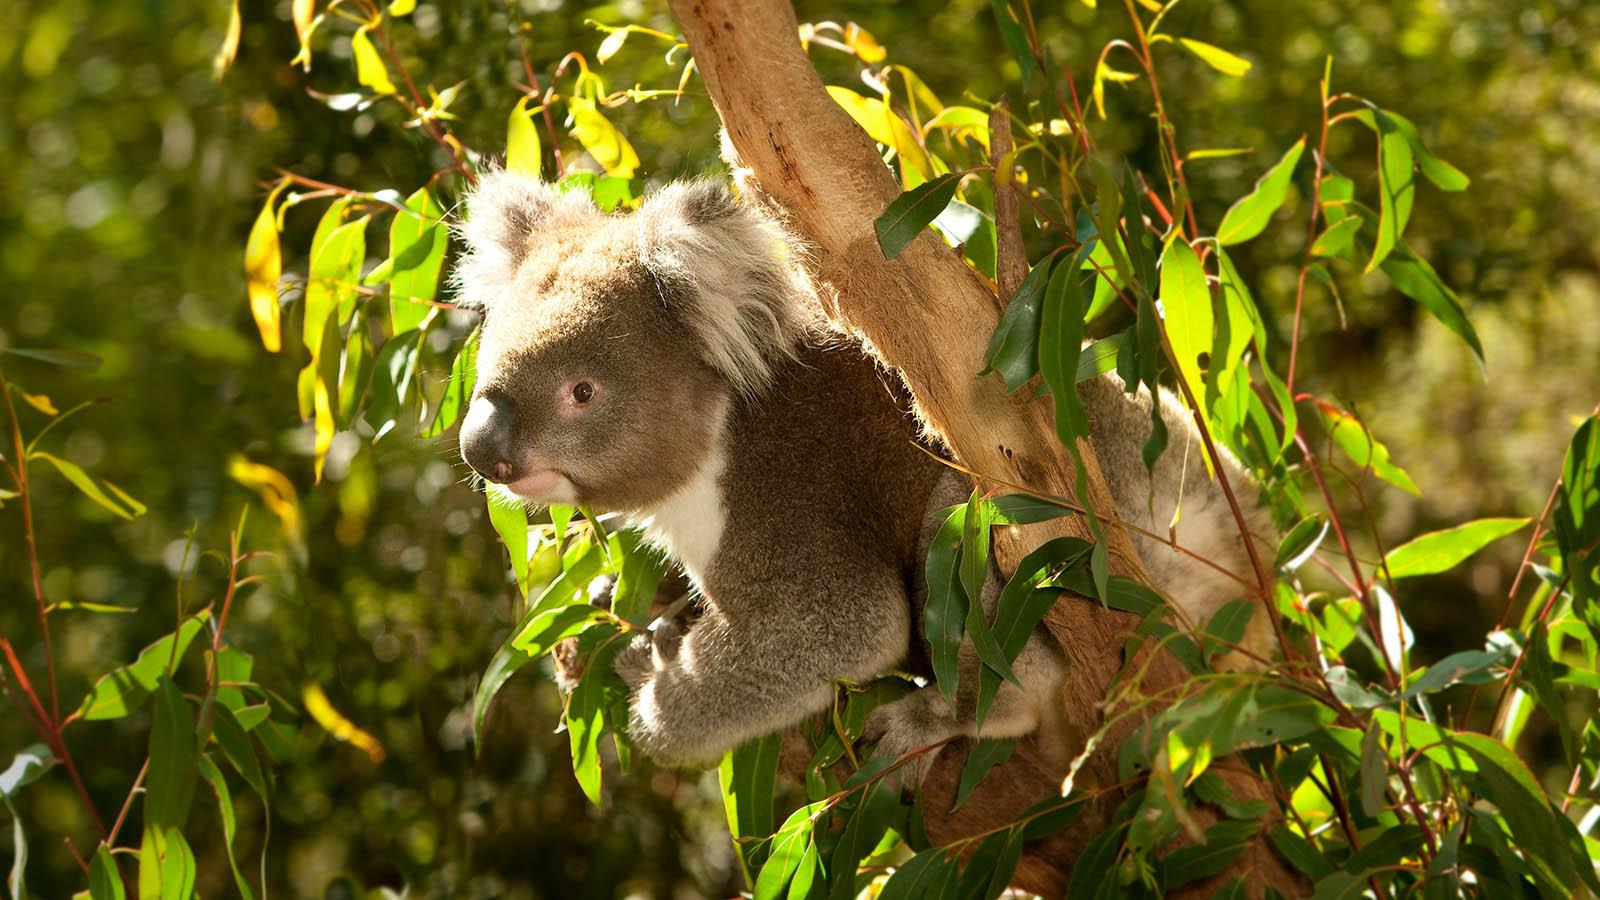 Koala at Healesville Sanctuary, Yarra Valley & Dandenong Ranges, Victoria, Australia